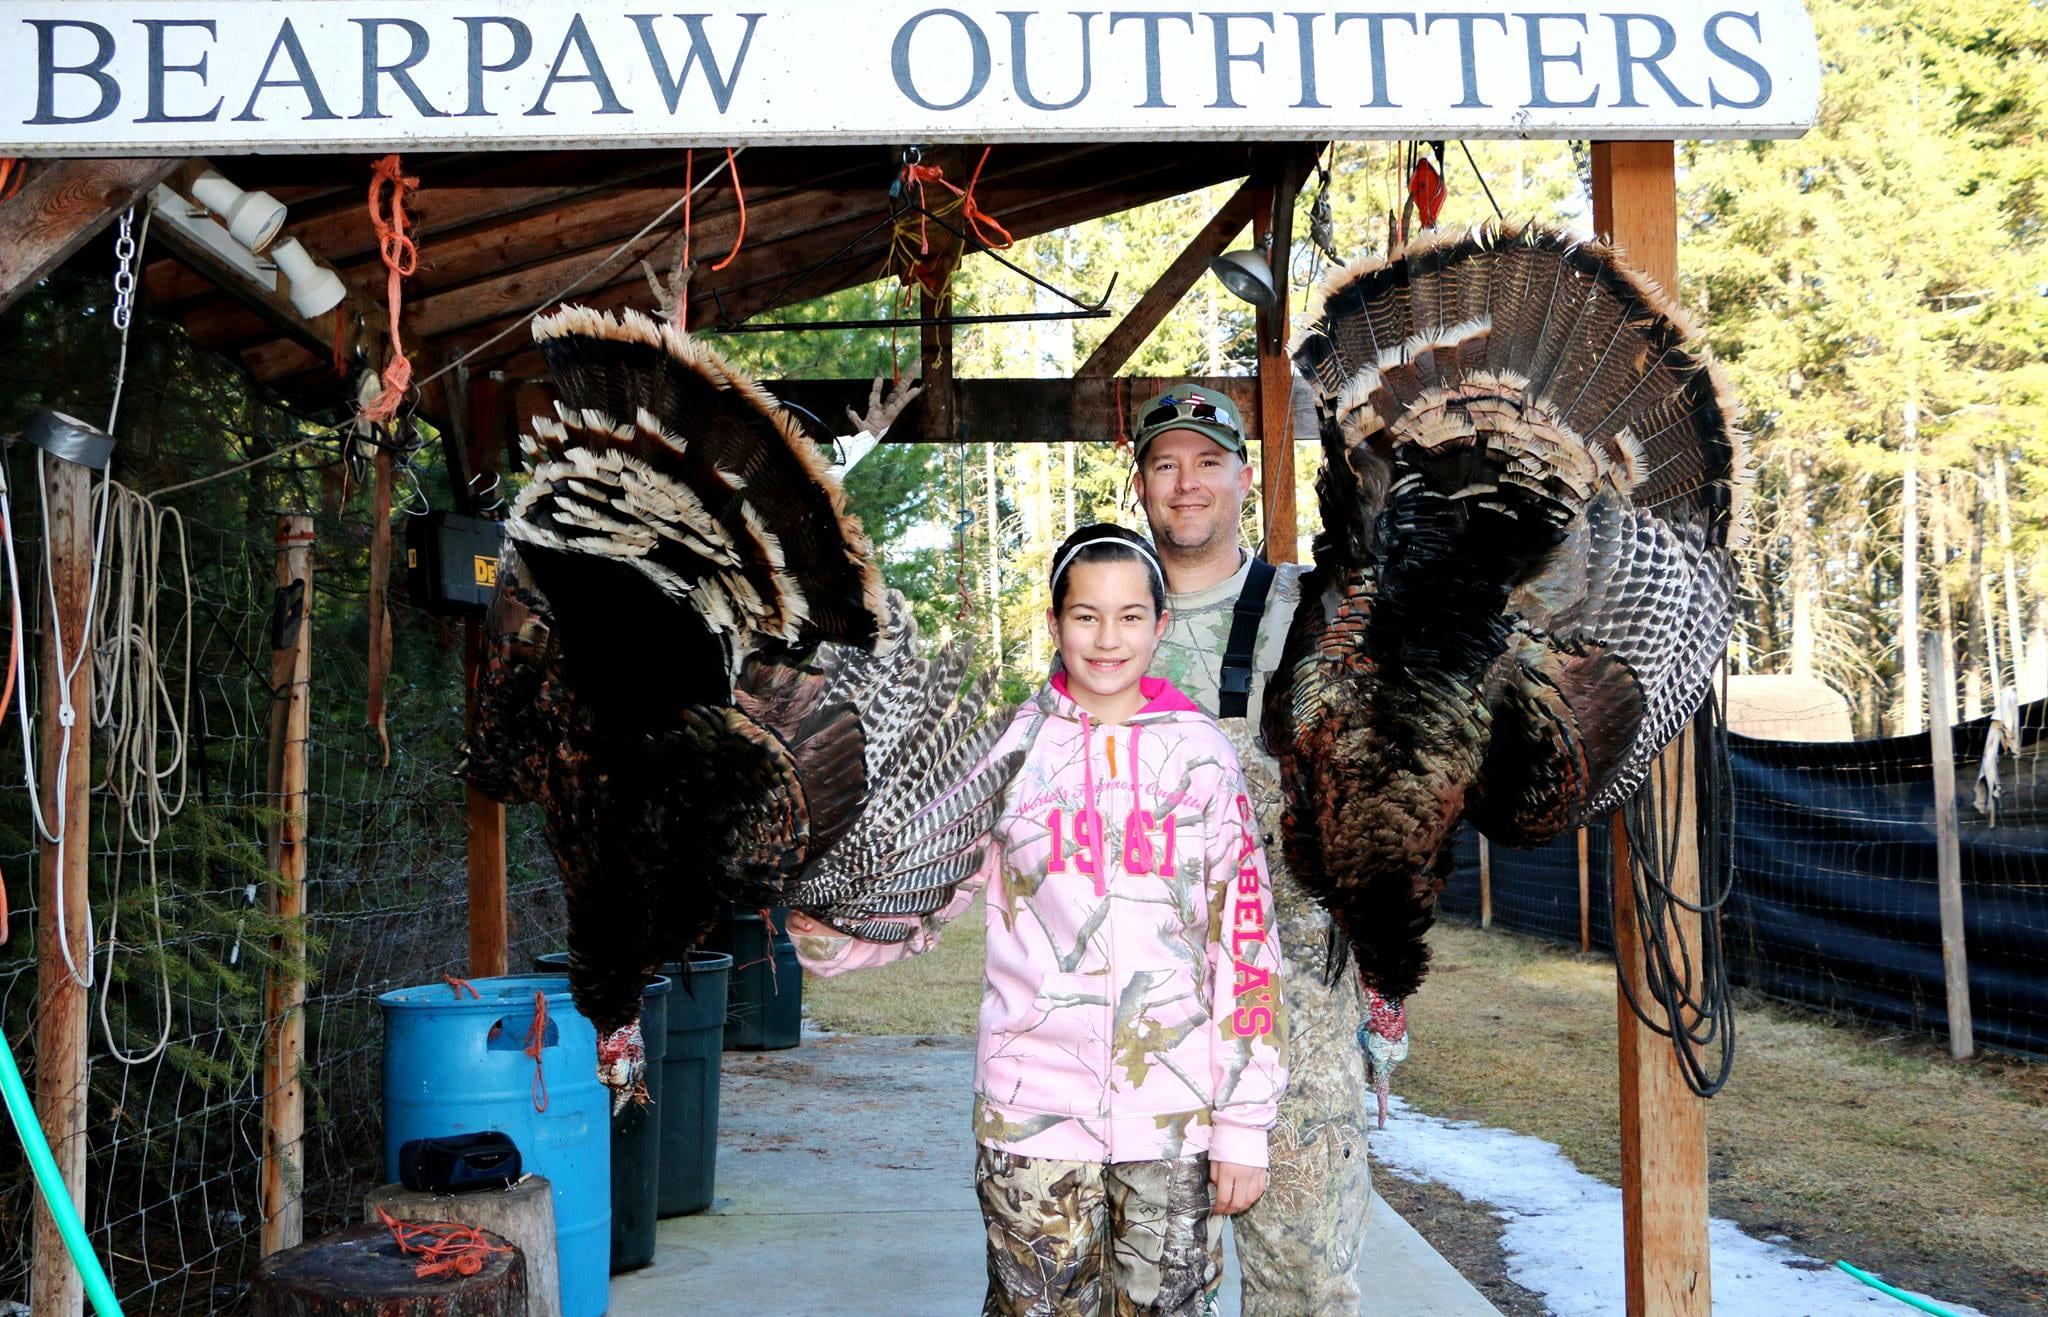 Bearpaw Outfitters: Washington Turkey Hunting